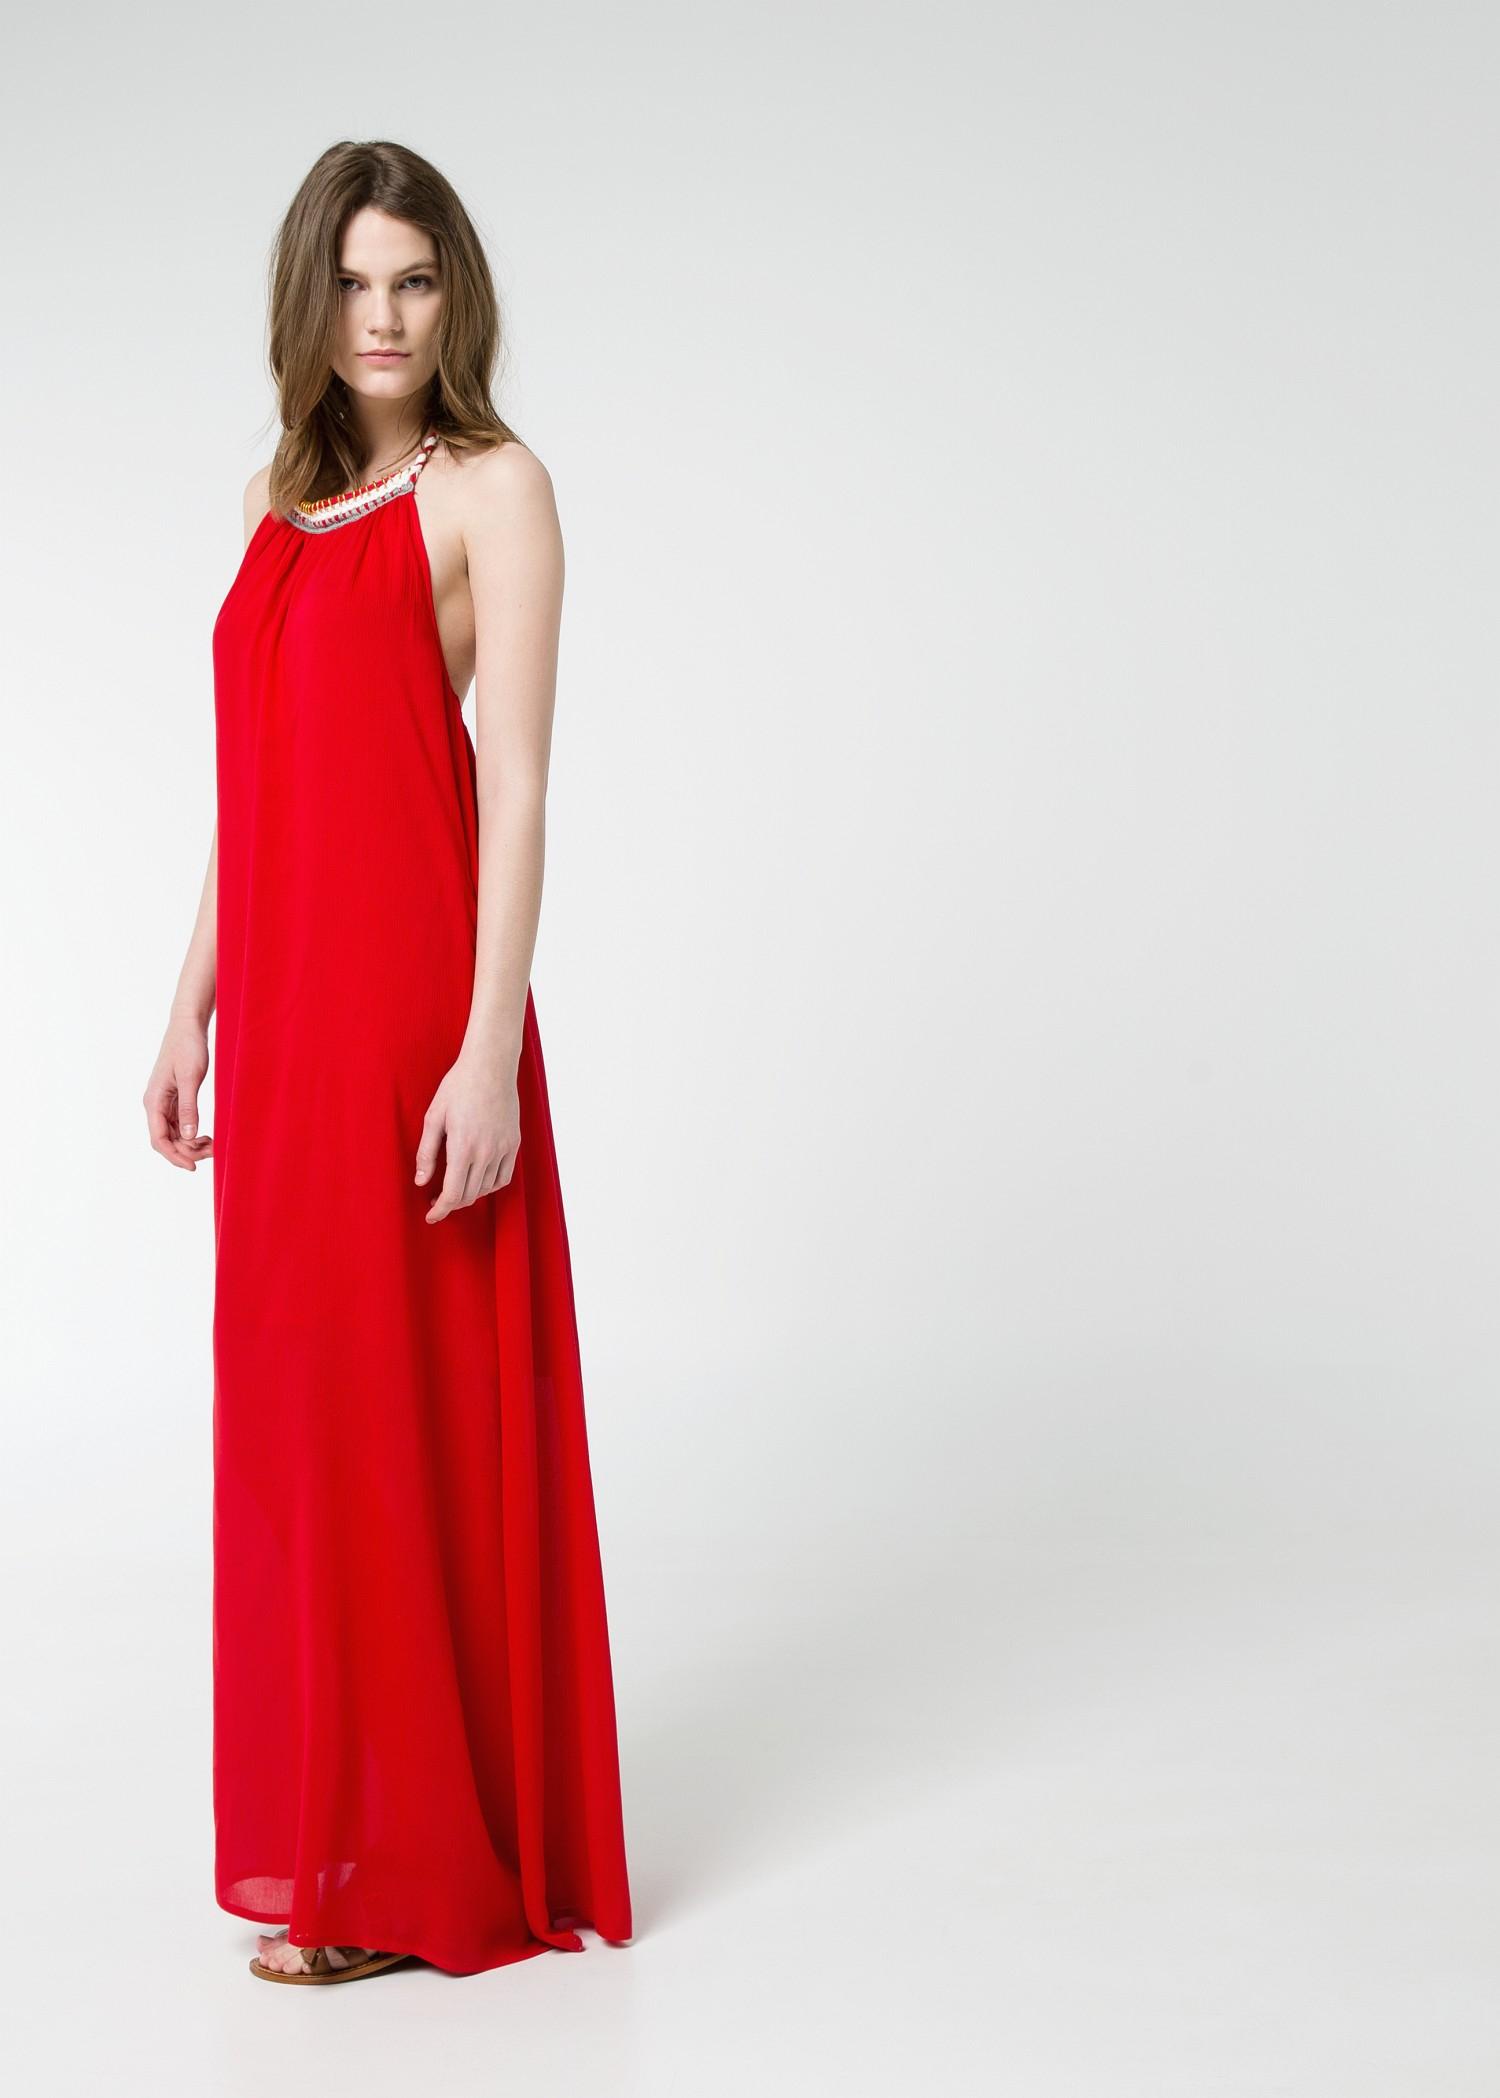 Mango Halter Long Dress in Red   Lyst